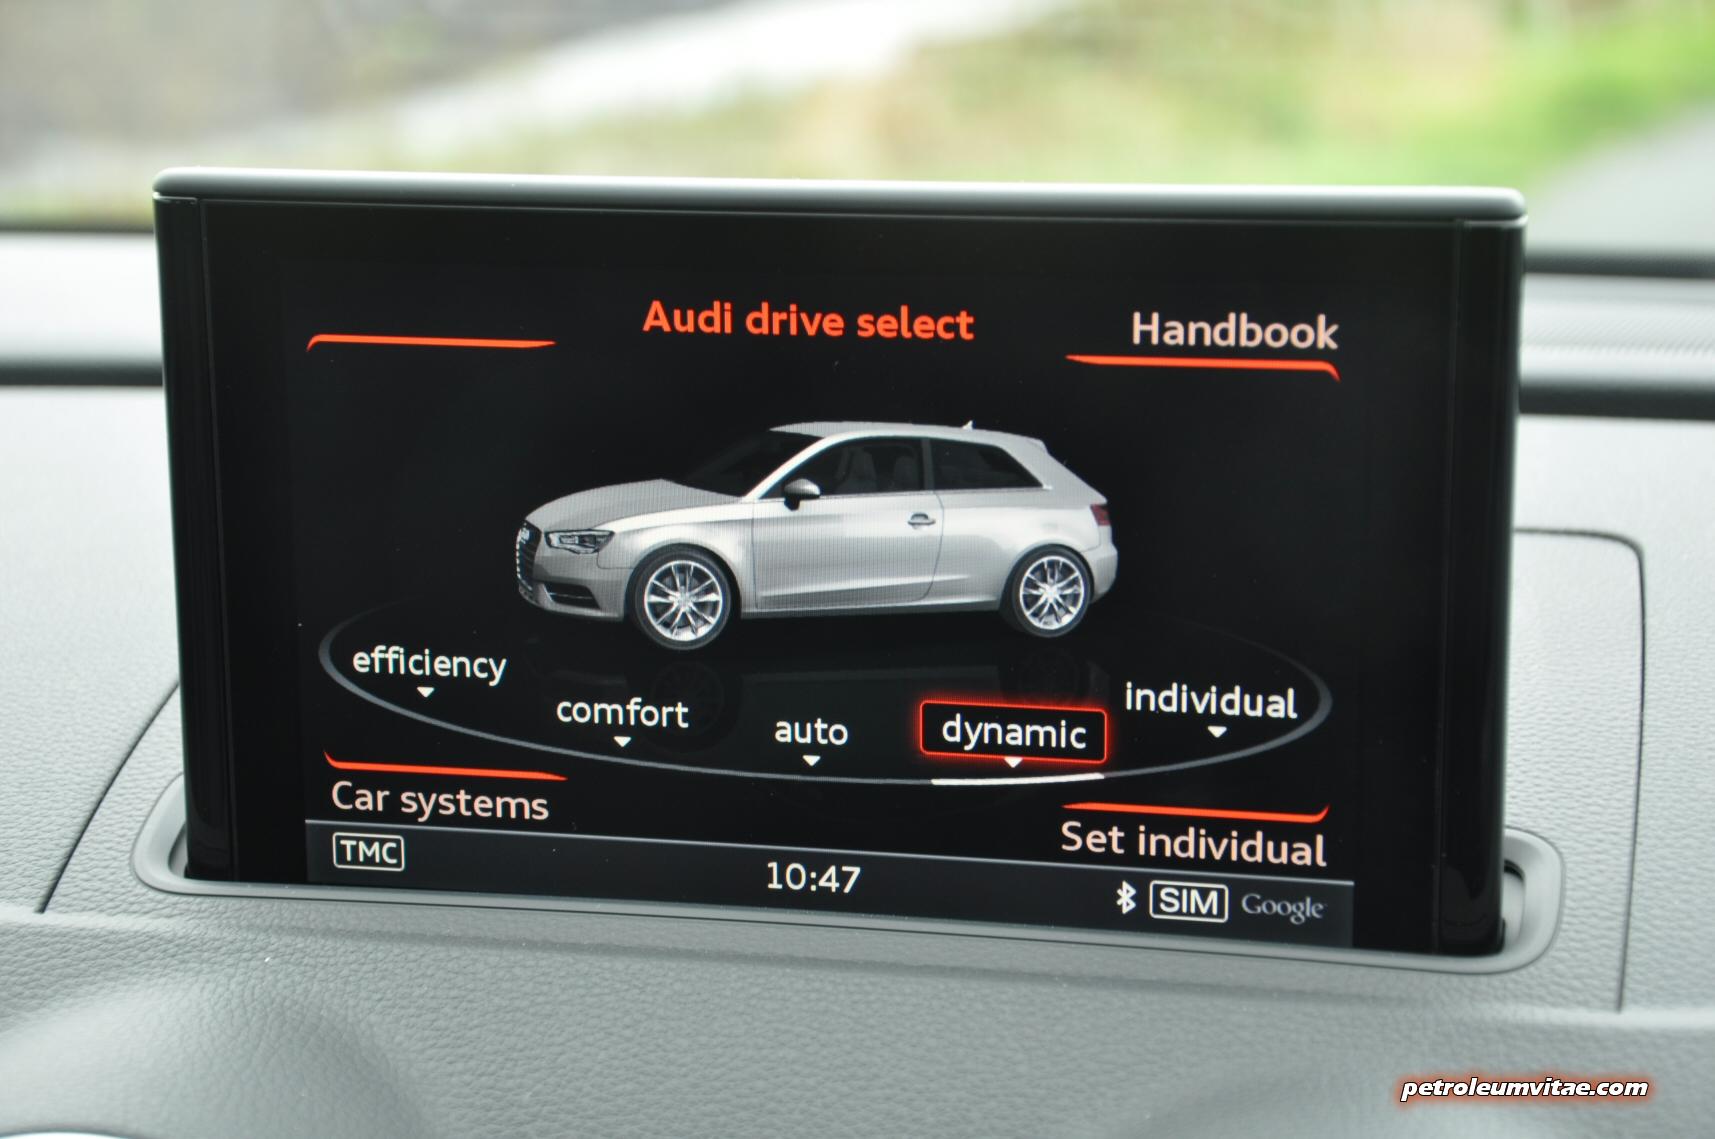 Audi A3 1 4 TFSI CoD S Line Full Road Test Review Petroleum Vitae